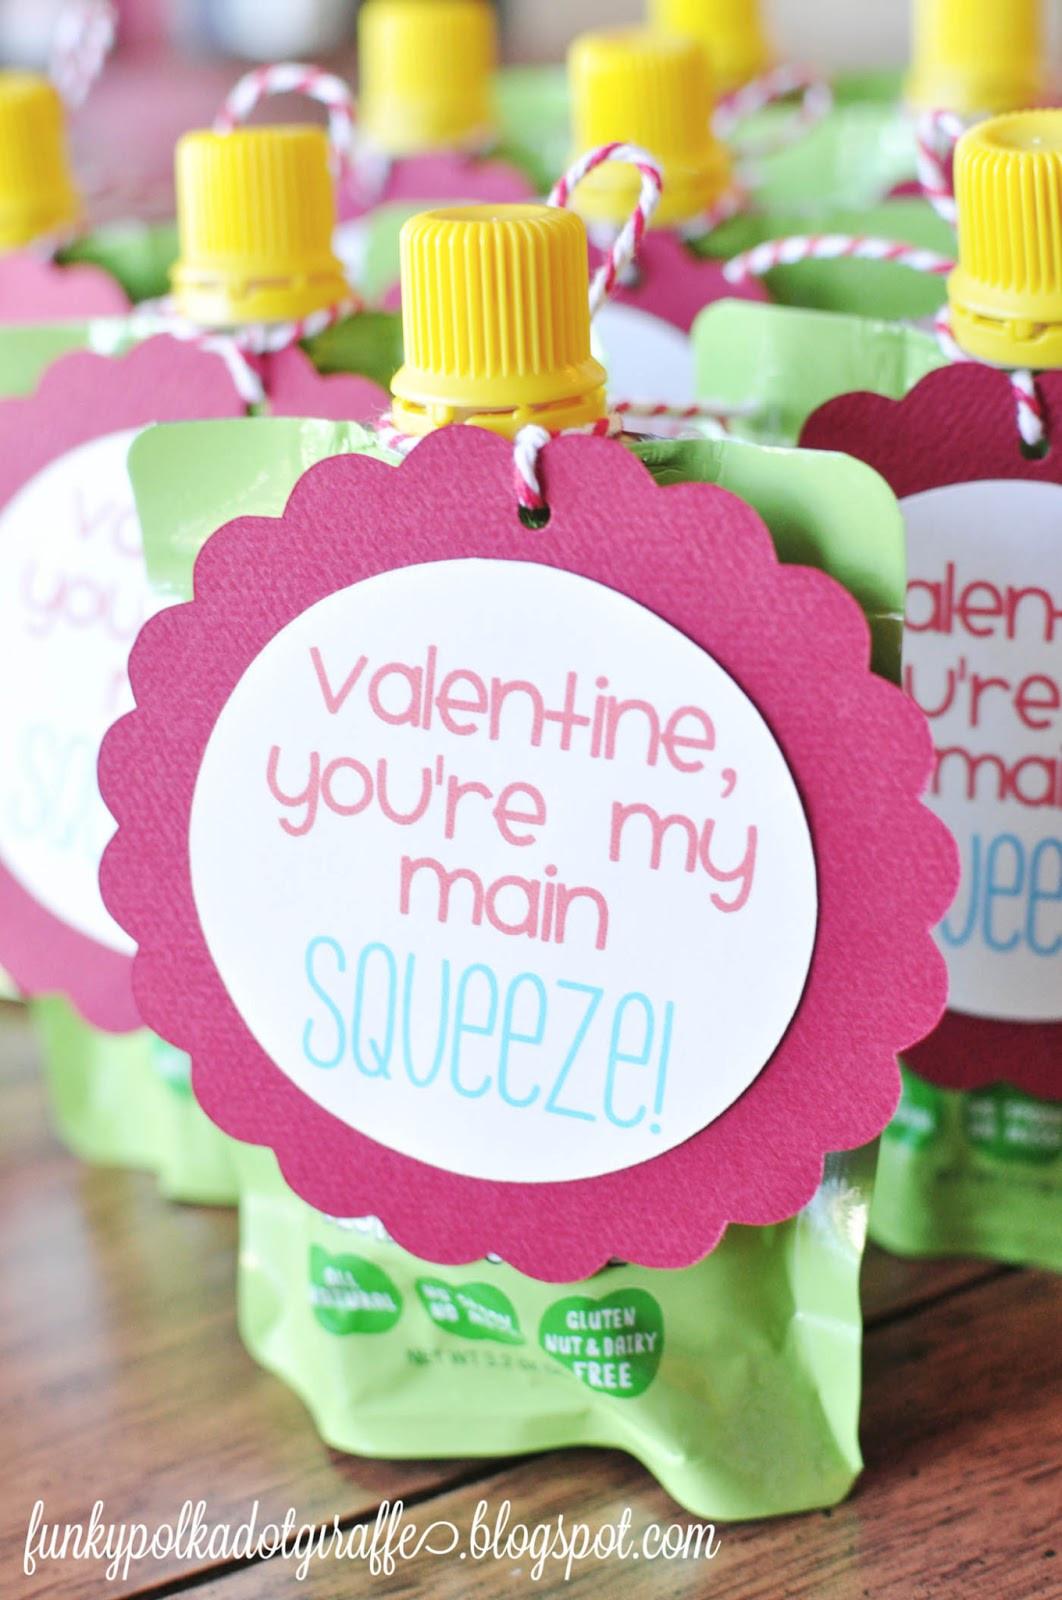 Toddler Valentines Day Gift Ideas  Funky Polkadot Giraffe Preschool Valentines You re My